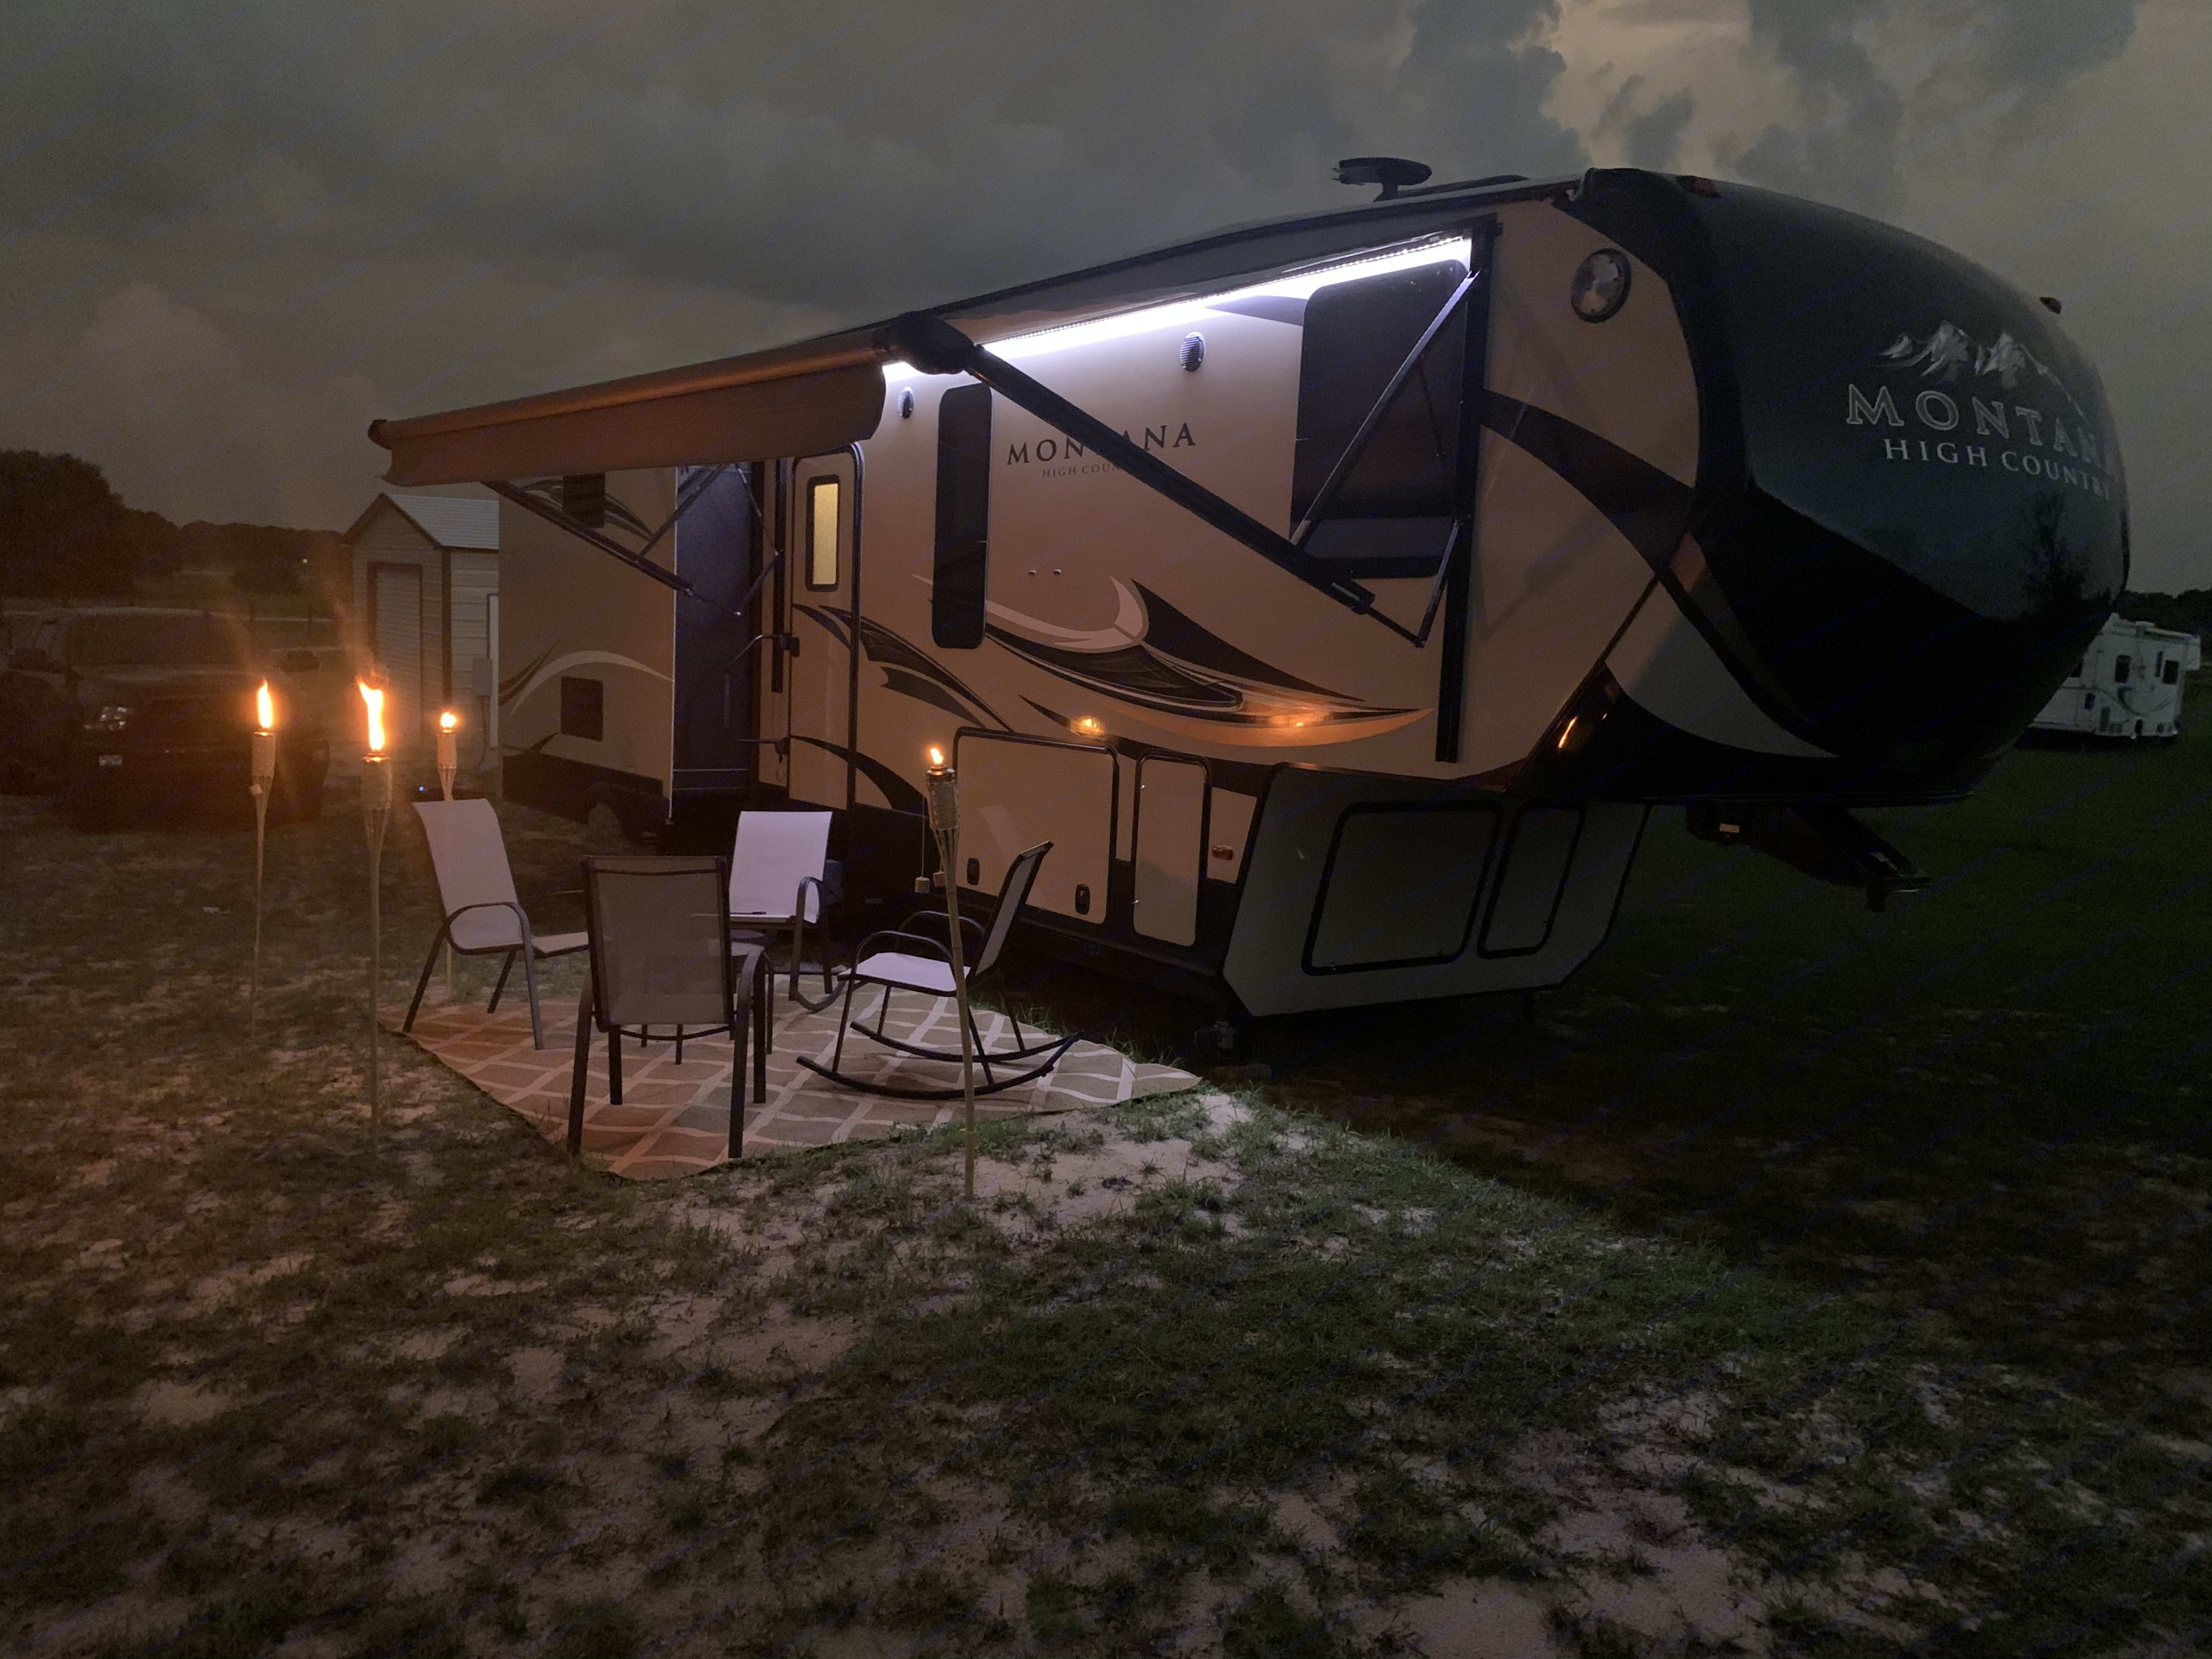 Enjoying the Night. Keystone Montana High Country 2018